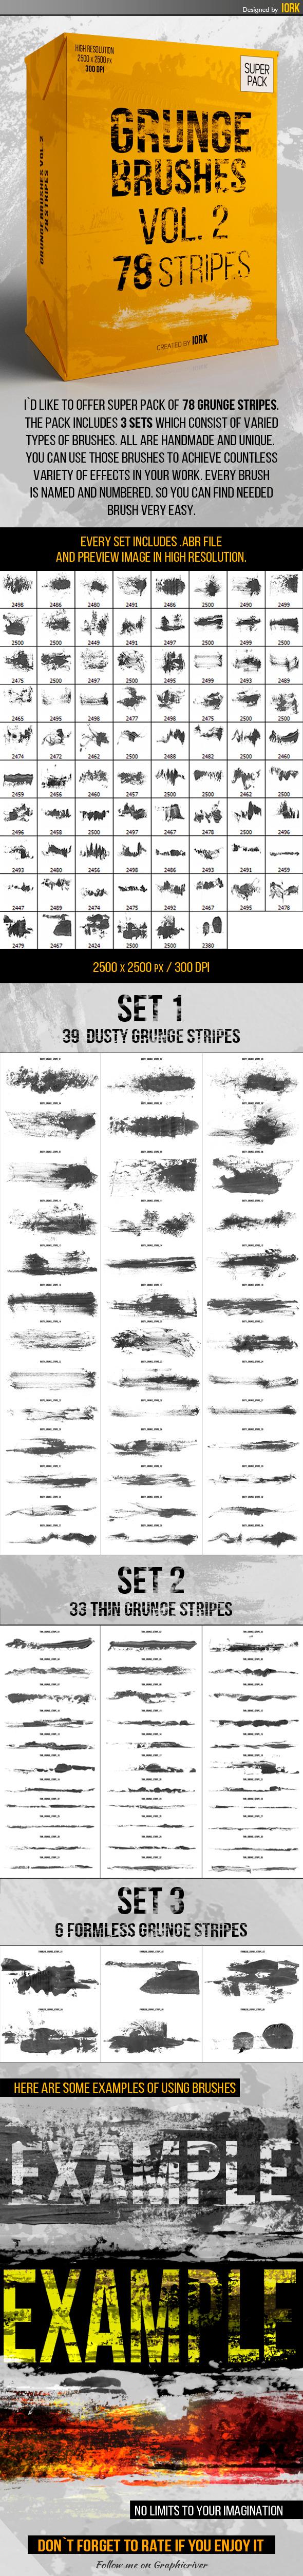 Grunge brushes Vol.2 - 78 stripes - Grunge Brushes